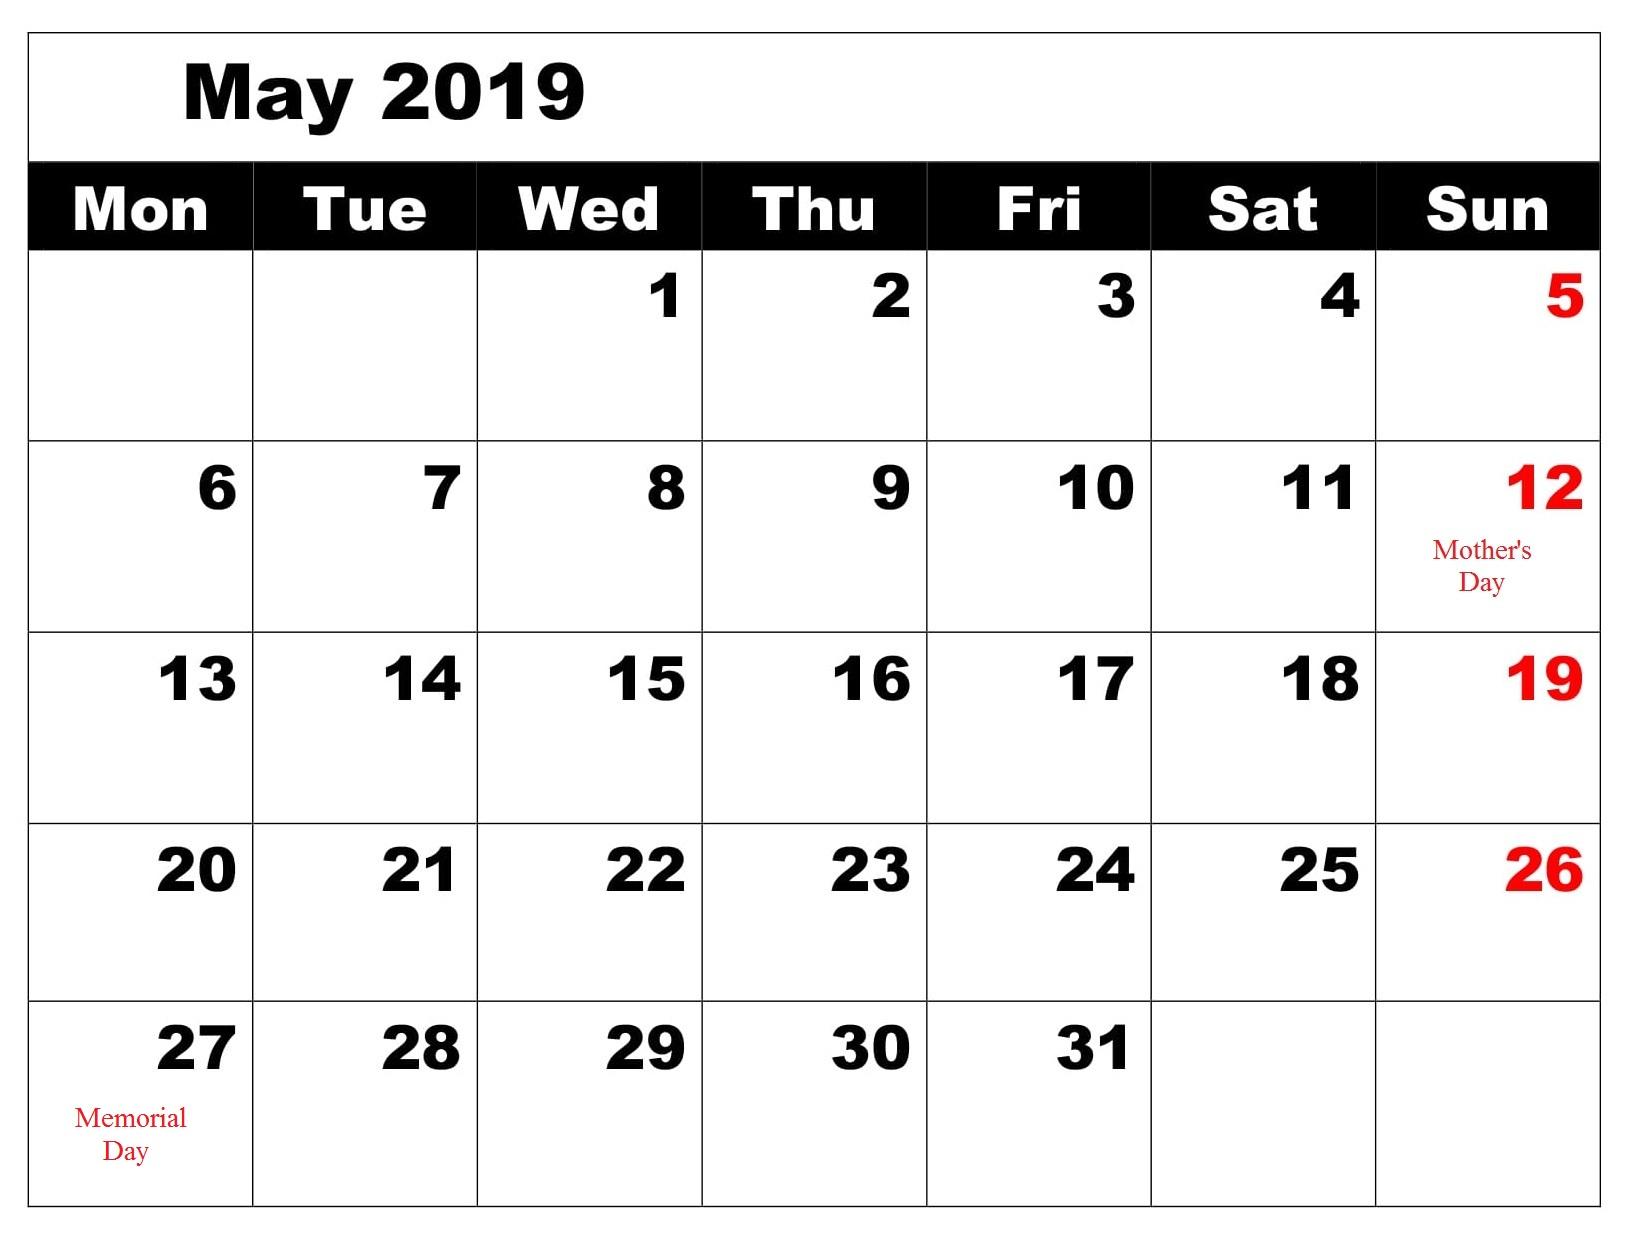 May Calendar 2019 Blank With Holidays